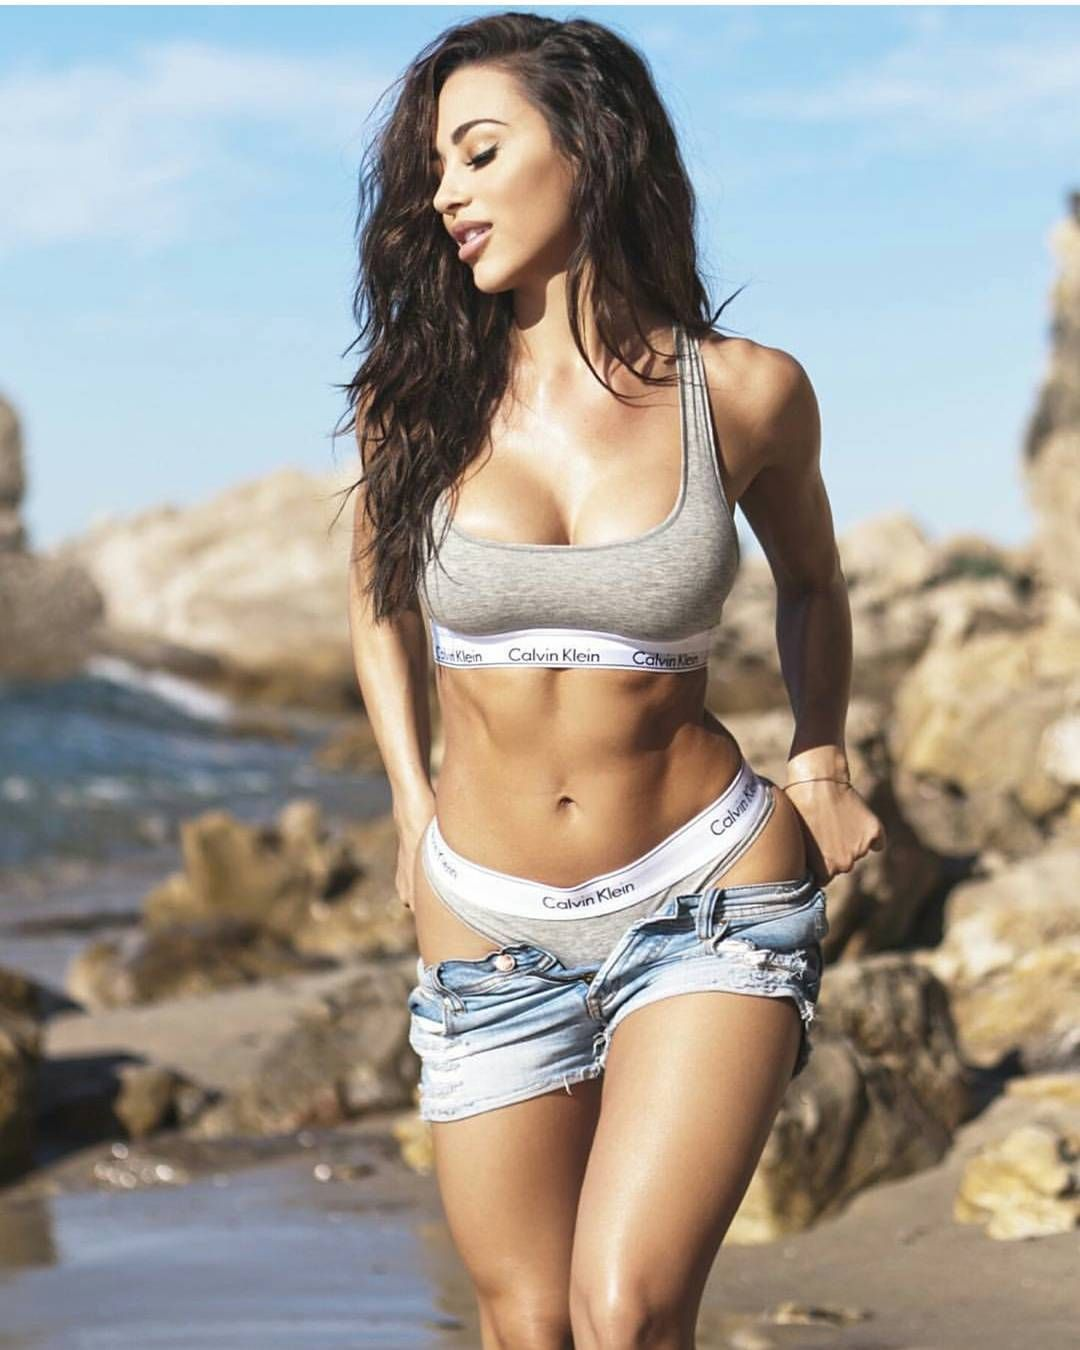 Frauen körper perfekter Kein perfekter